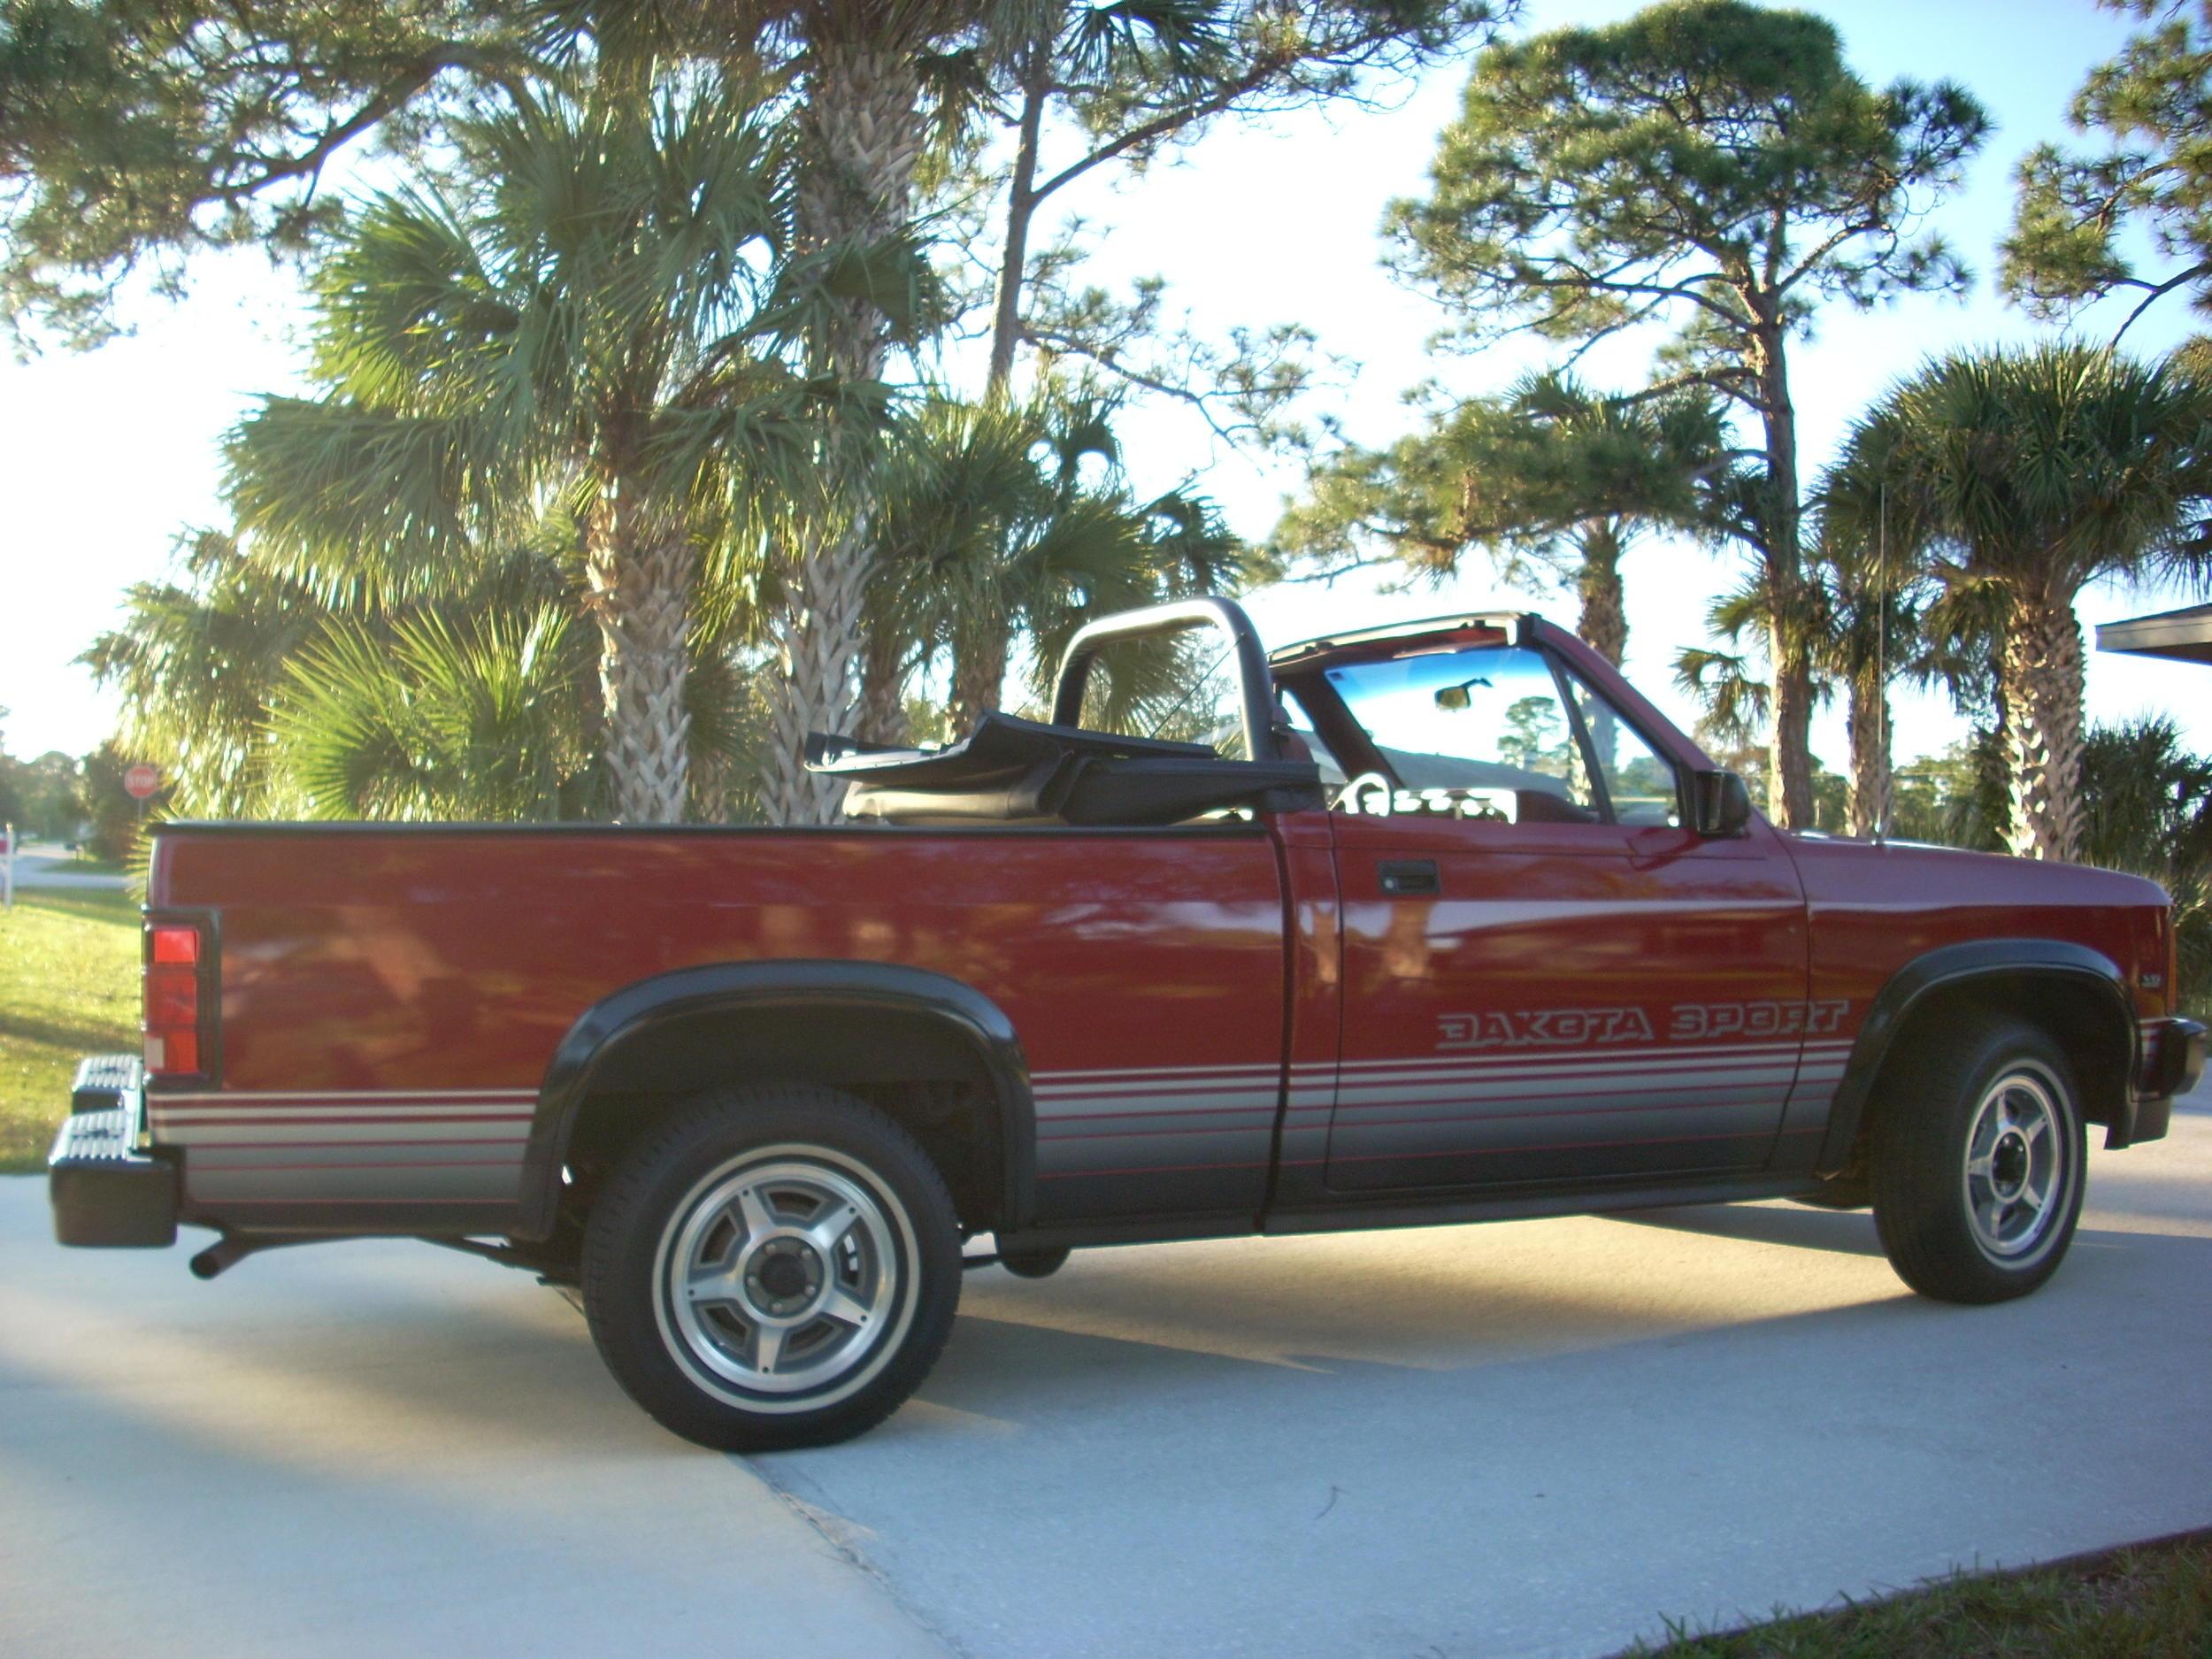 D Dodge Dakota Sport Convertible Sale Dscn on 1989 Dodge Dakota Convertible For Sale